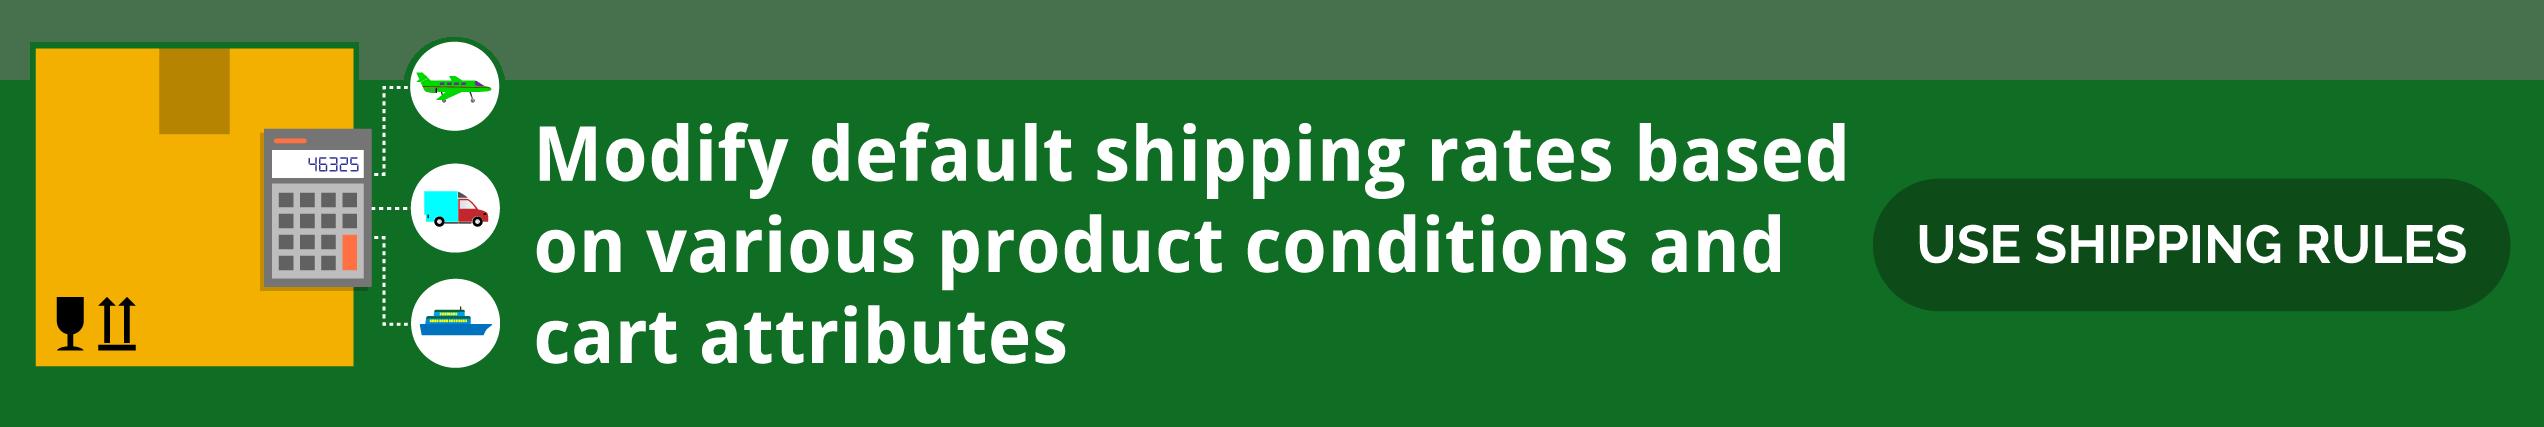 CTA_M2-shipping-rules